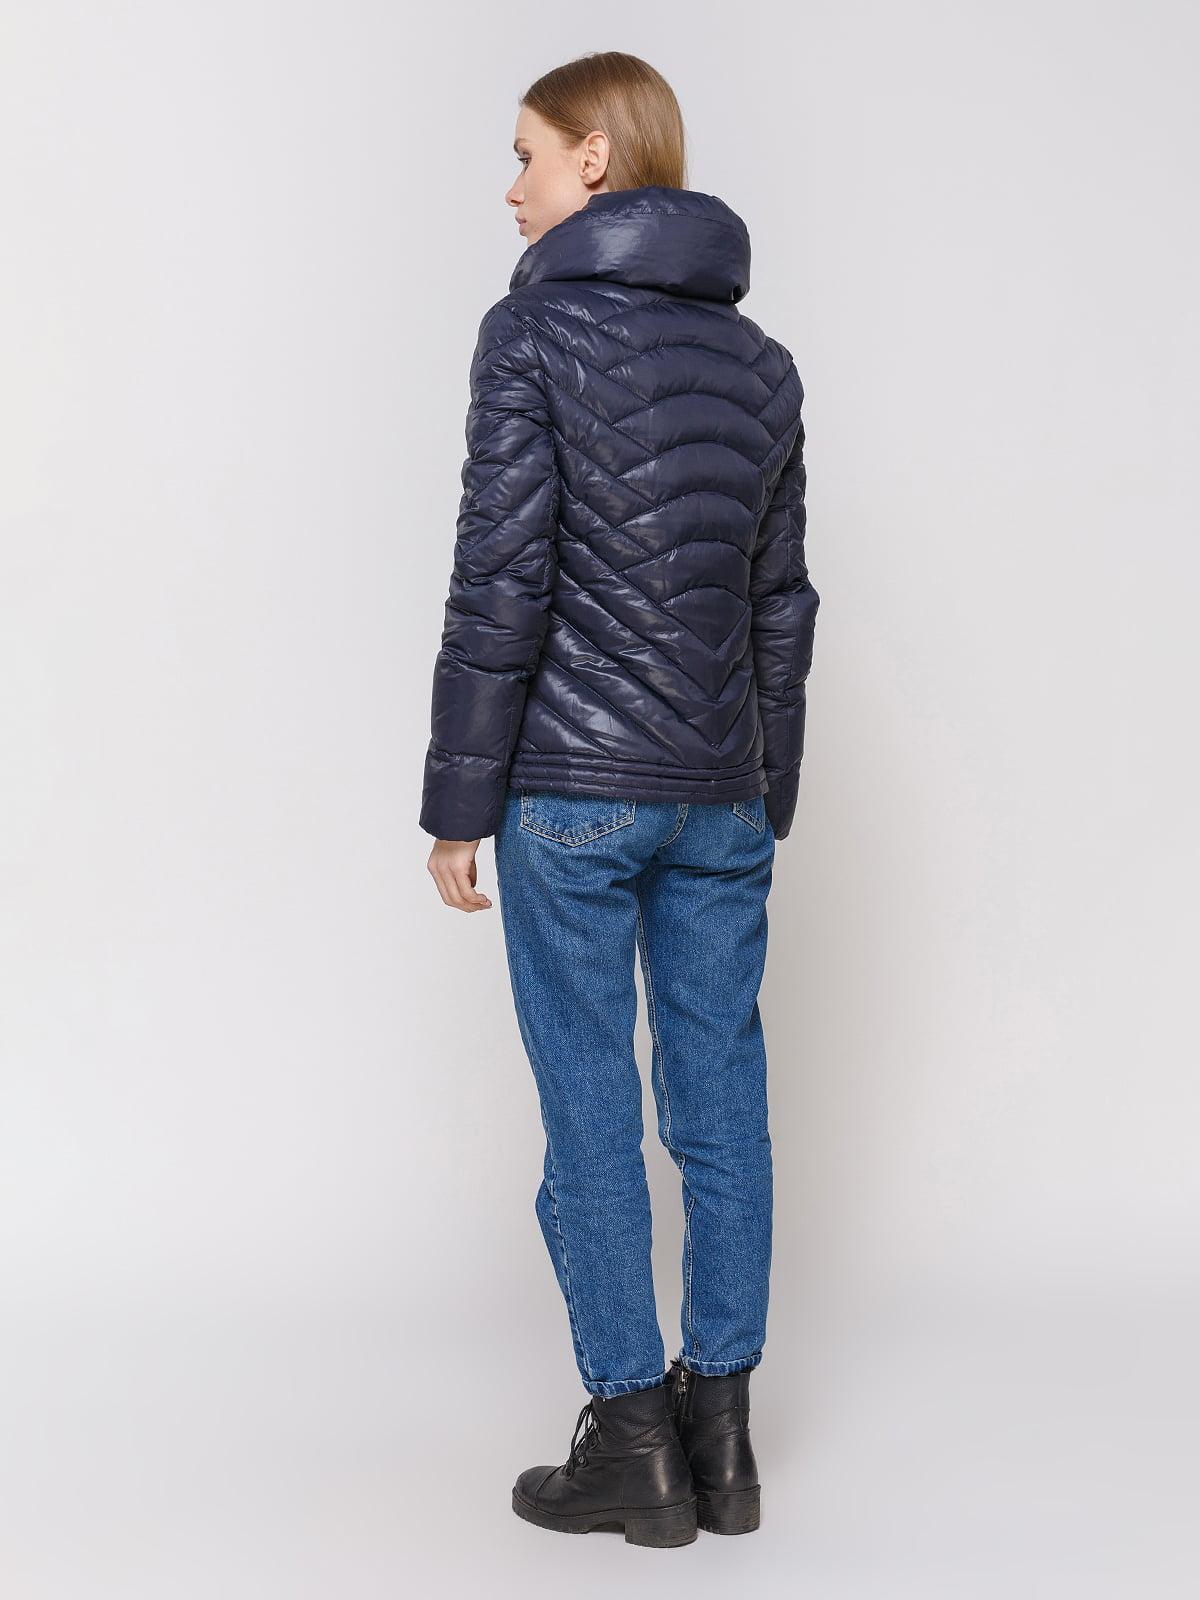 Куртка темно-синяя | 4652910 | фото 3